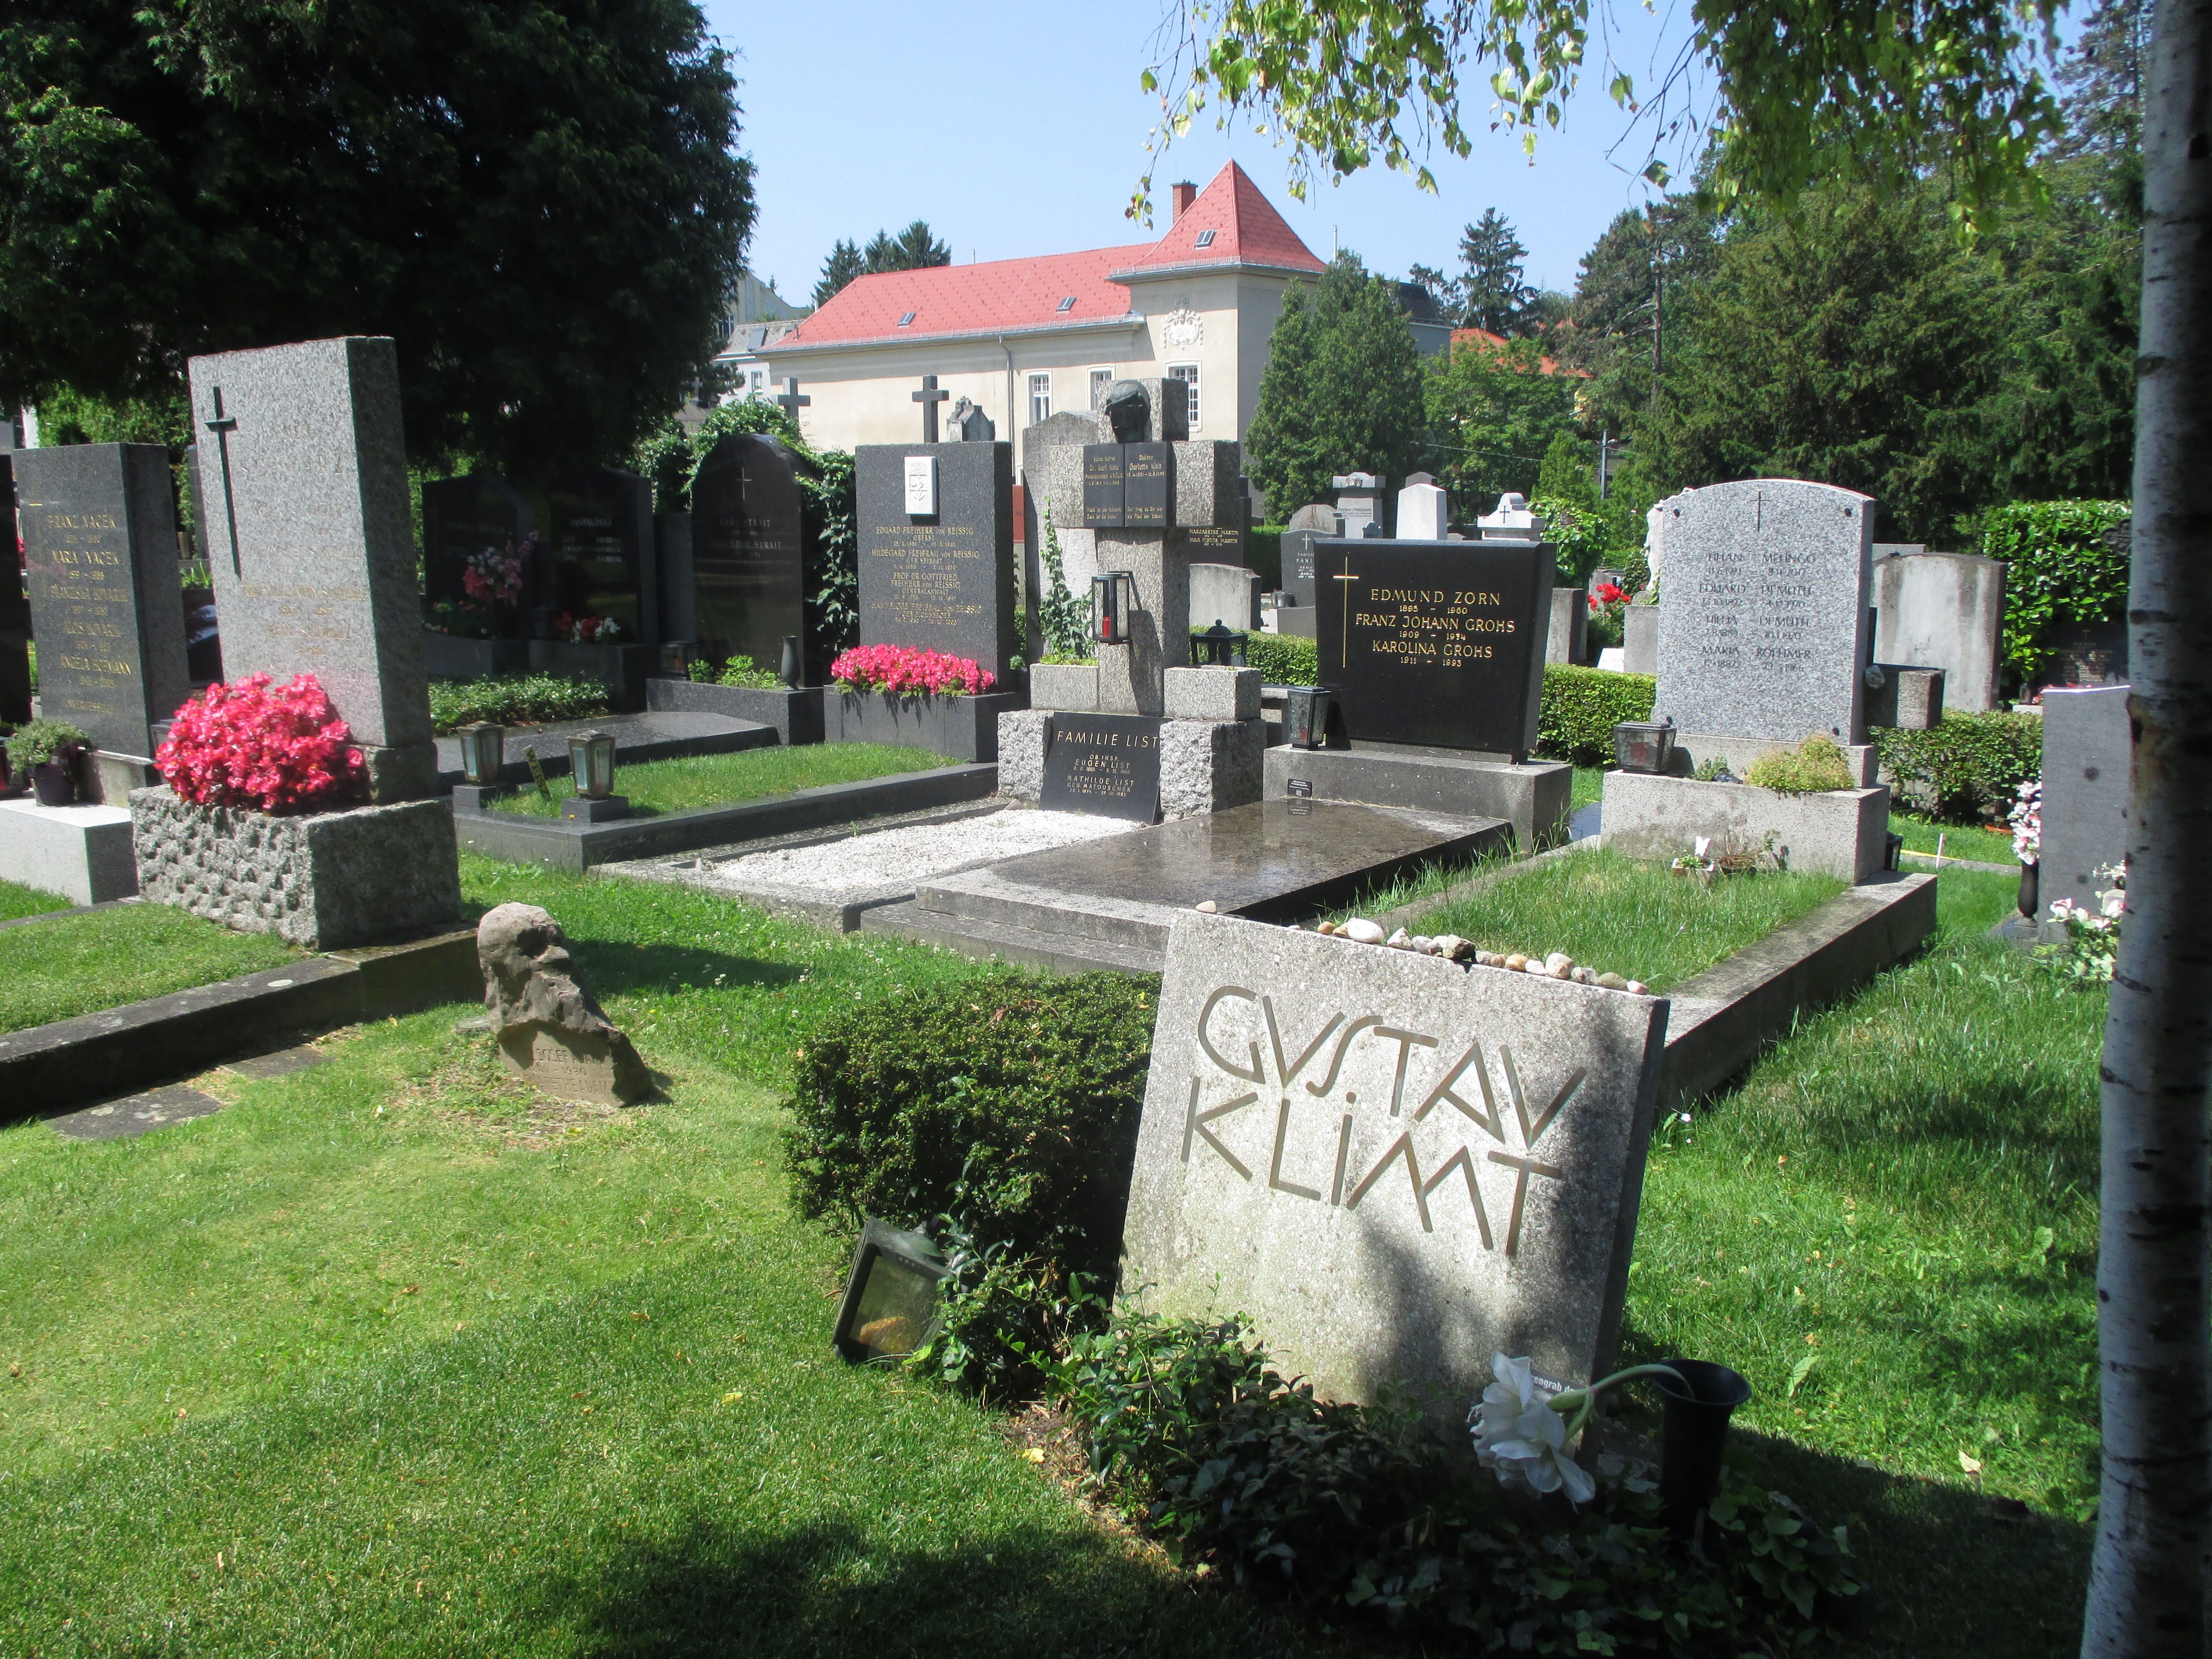 Gustav klimt wikipedia klimts grab auf dem friedhof hietzing standort4817816299527777778 fandeluxe Image collections